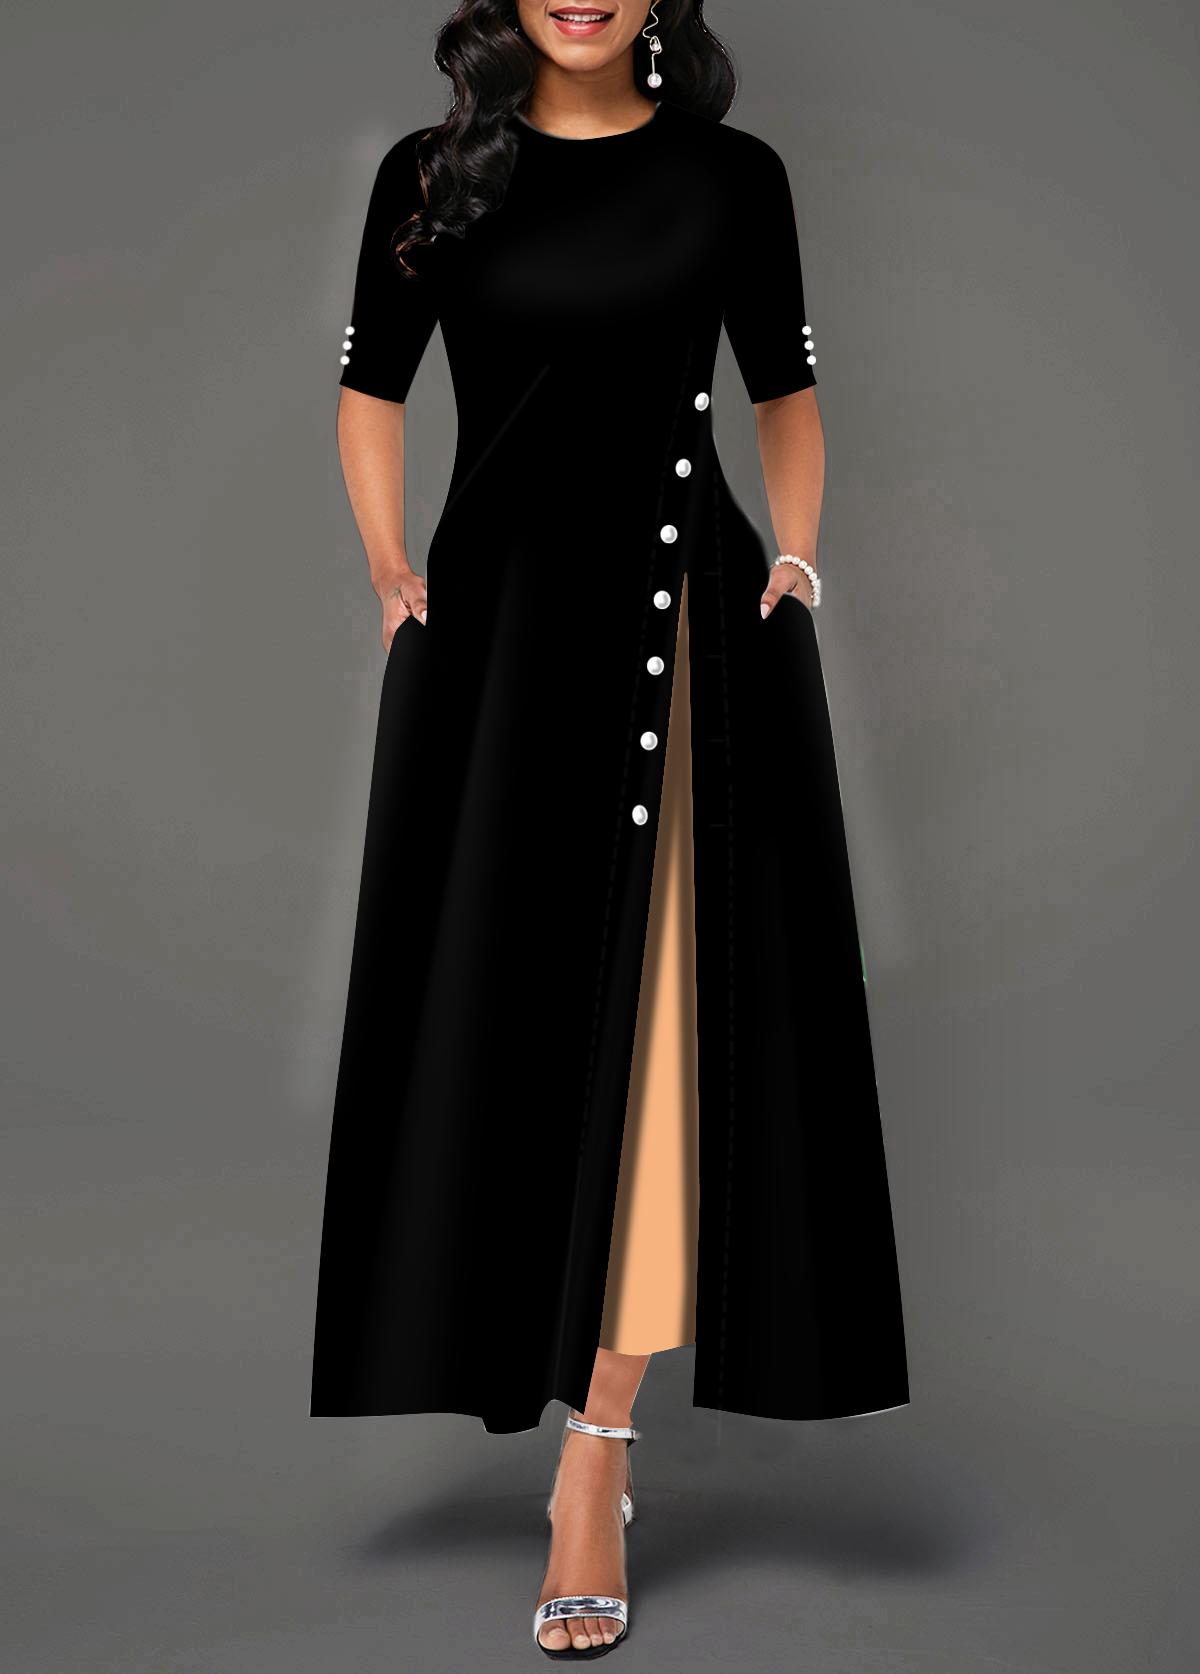 Side Slit Button Detail Half Sleeve Maxi Dress